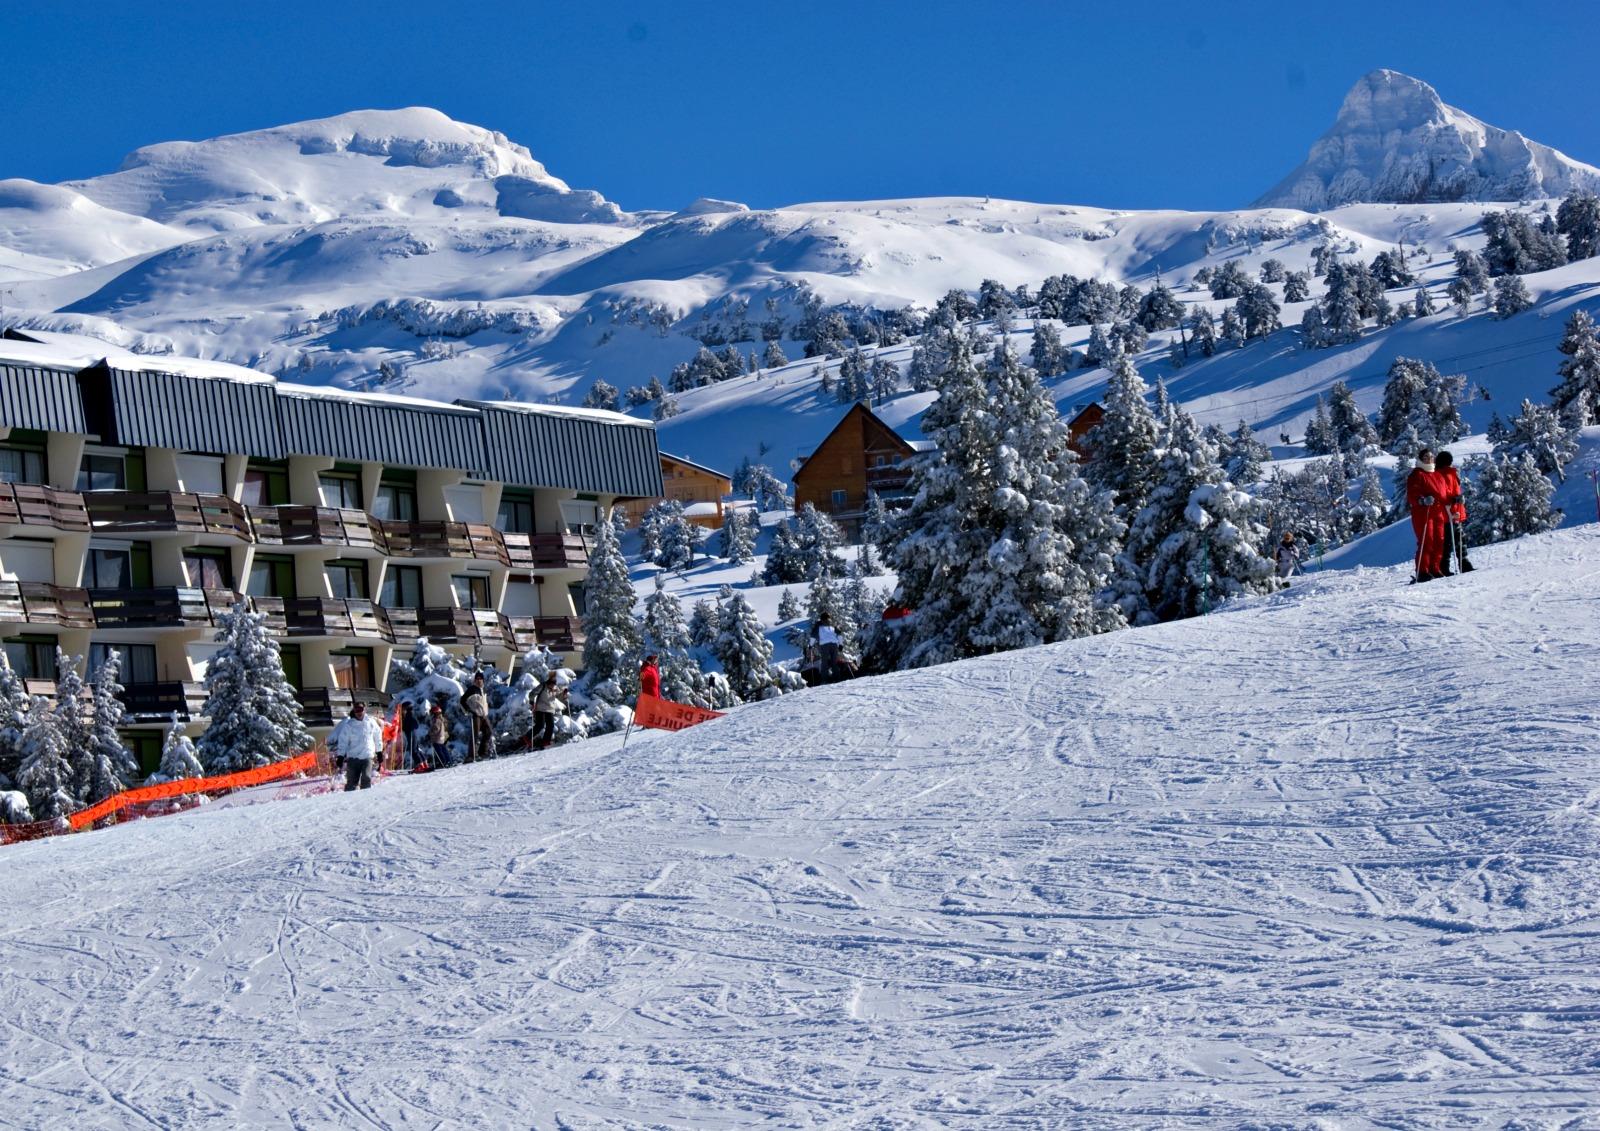 Station de ski la pierre saint martin arette 64 - Office de tourisme la pierre saint martin ...